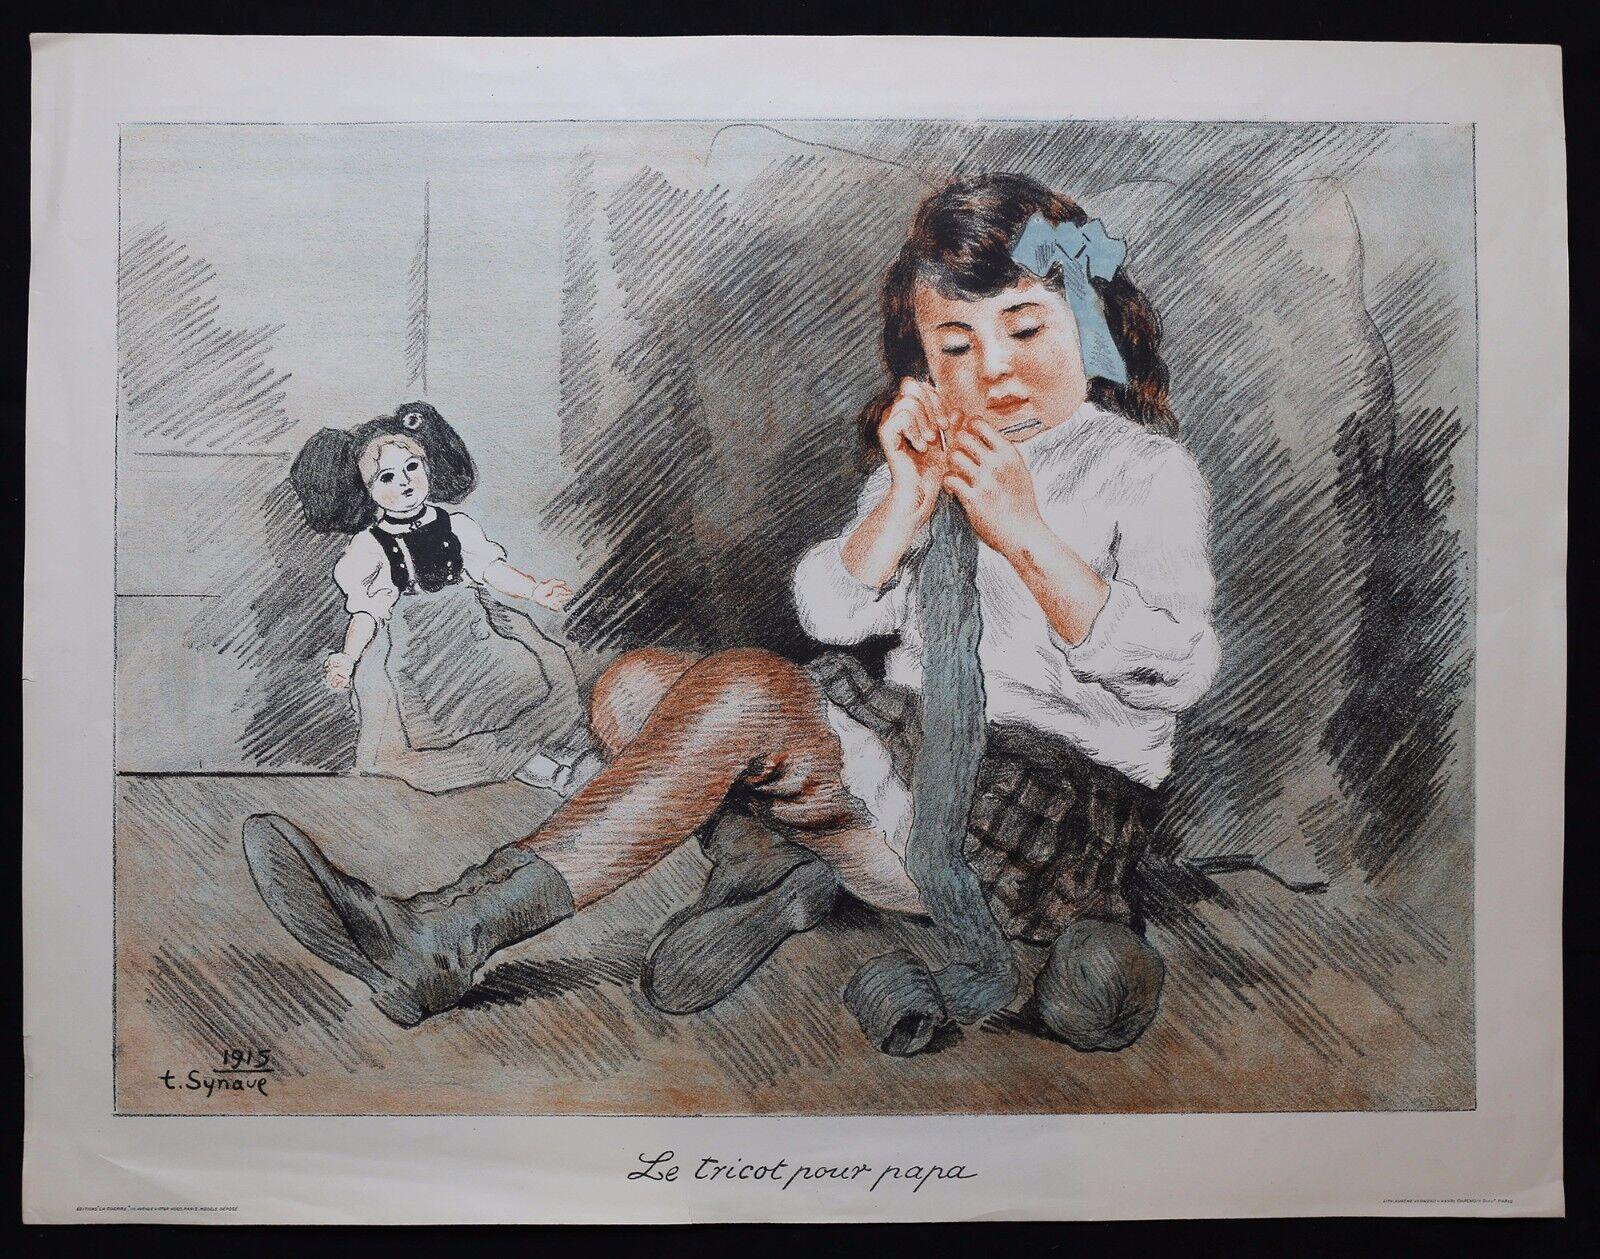 Tancrède Synave (1870-1936) Child Doll War Poster 1915 Alsace Lorraine